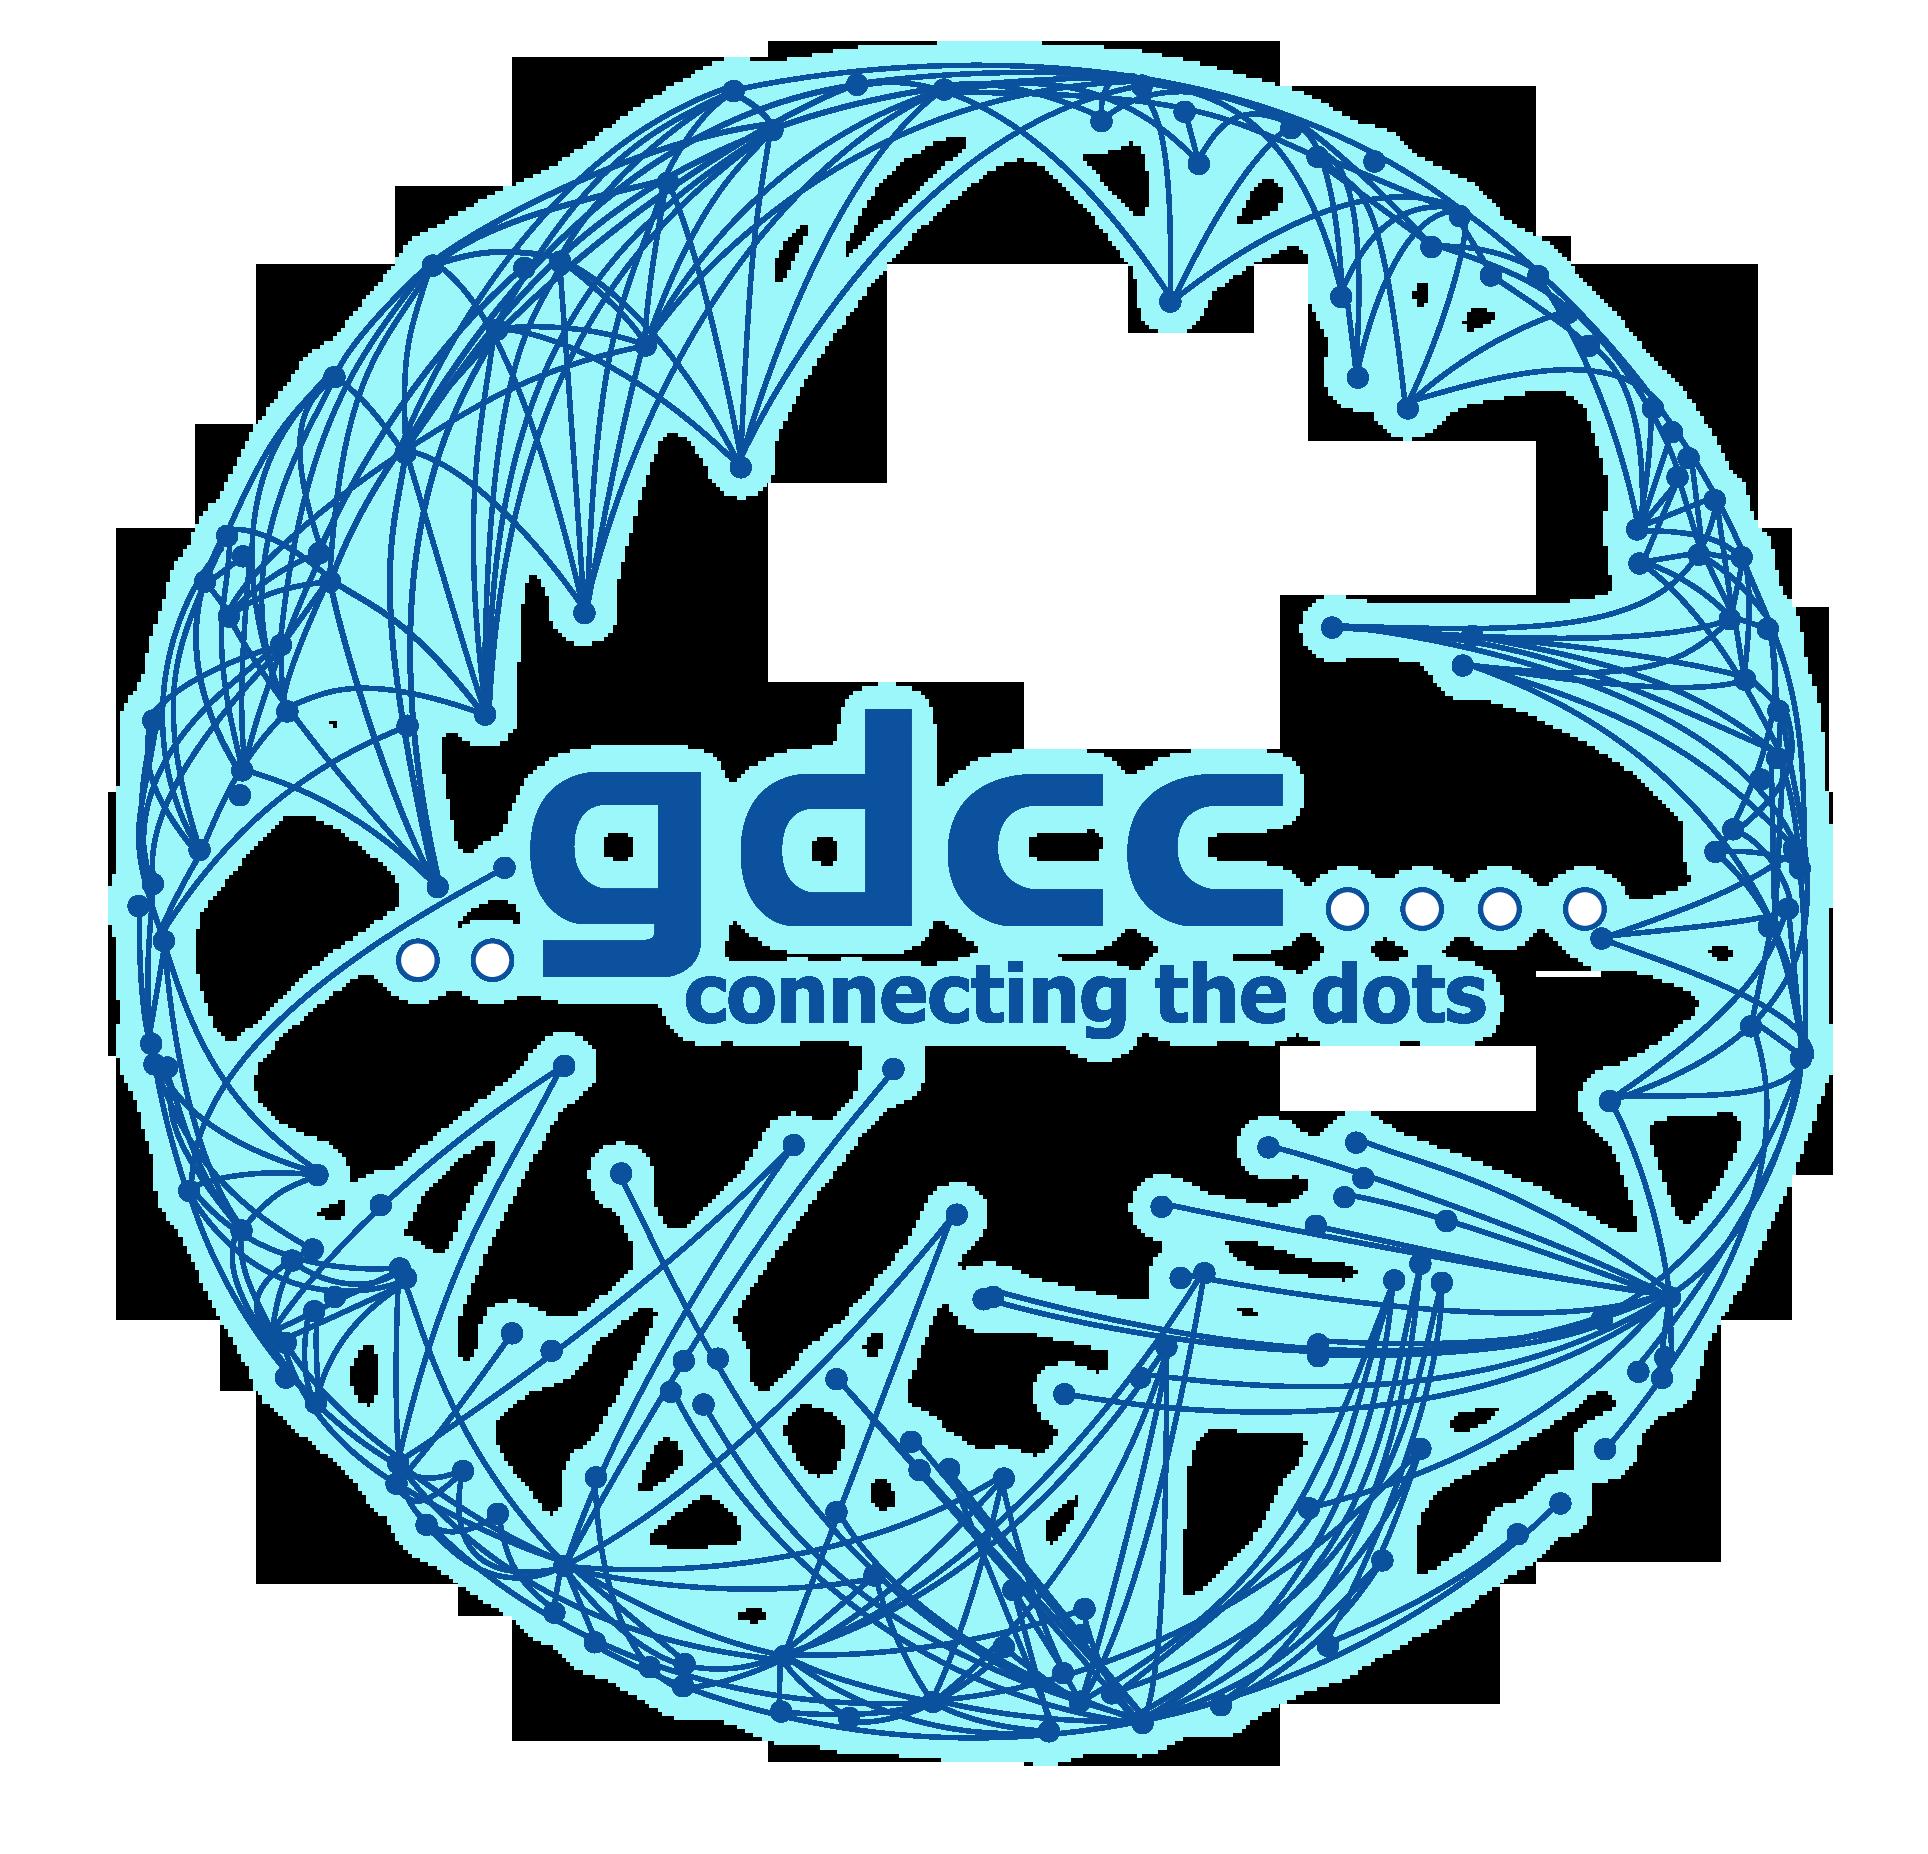 GDCC (Global Data Collection Company Ltd. ) Company Logo